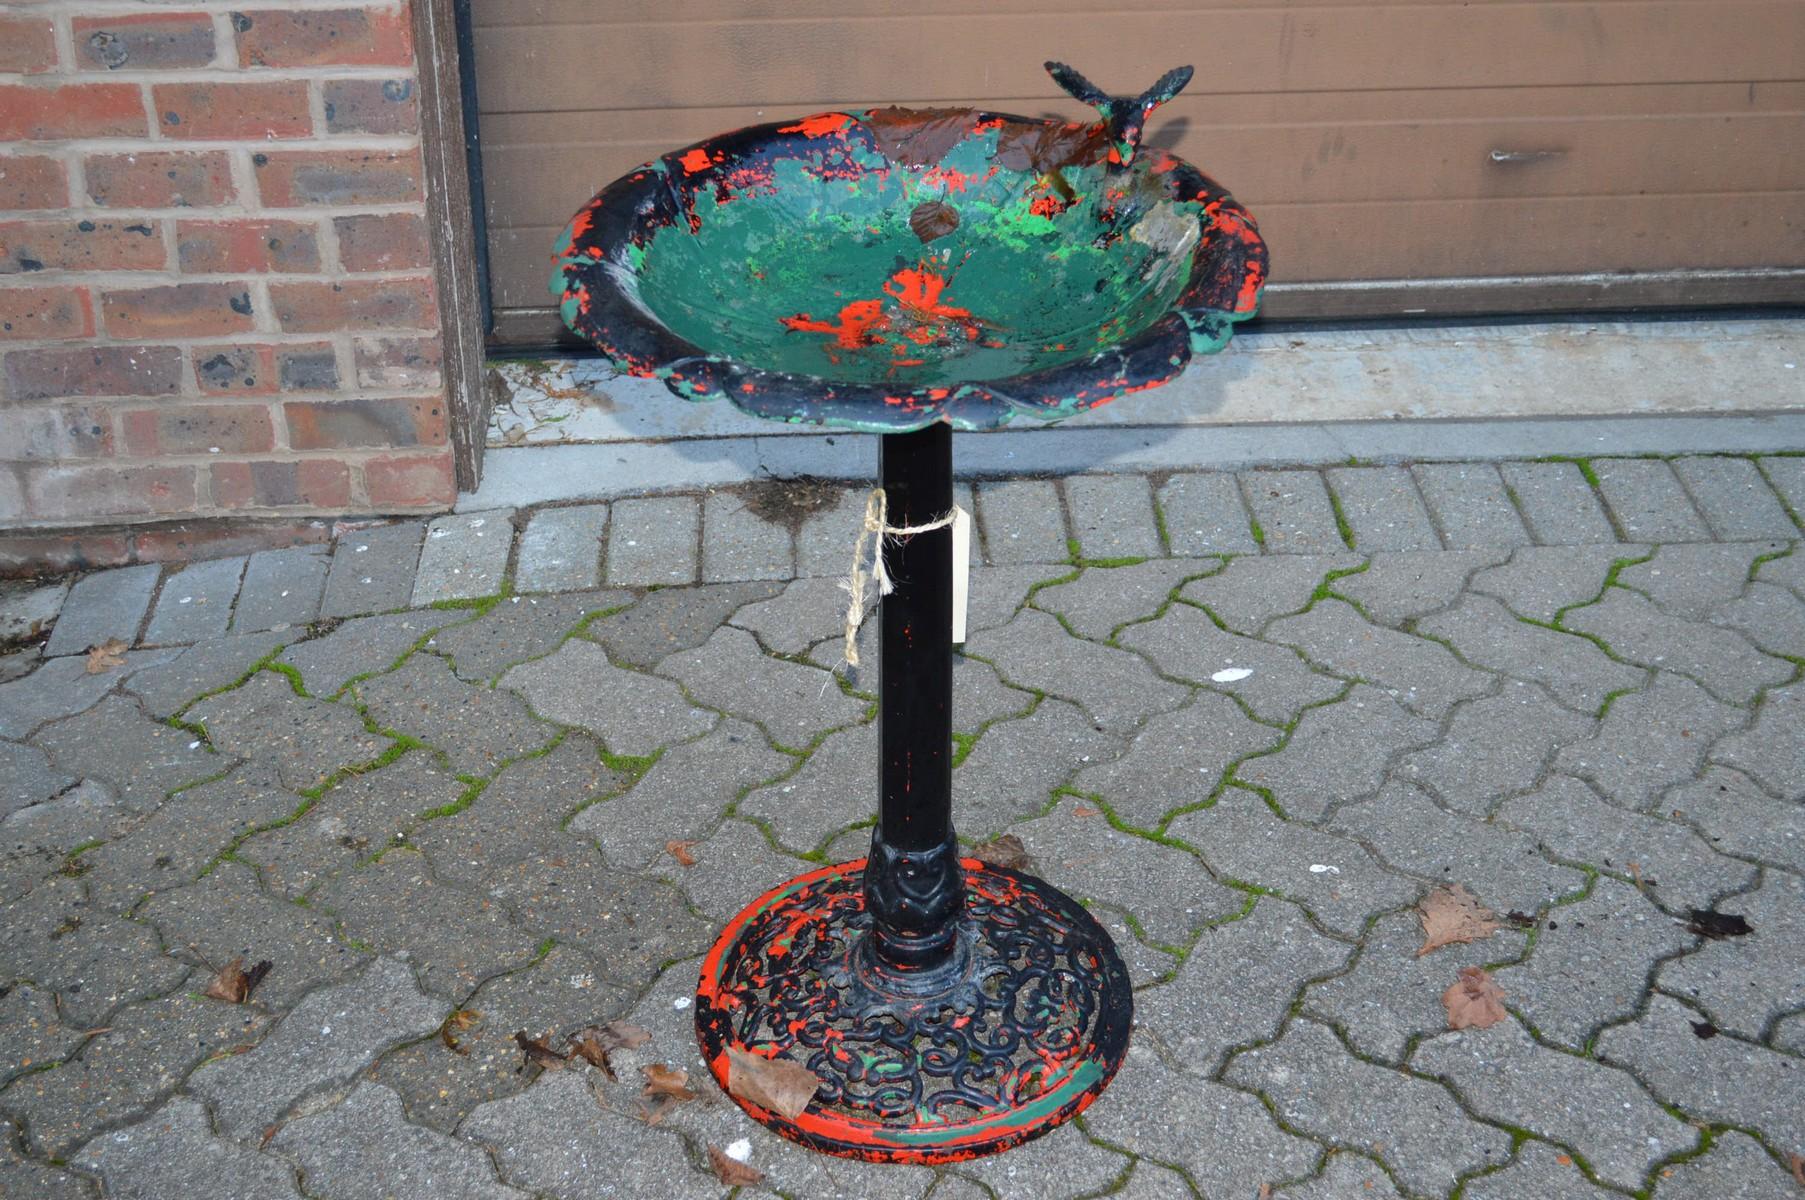 A metal bird bath.